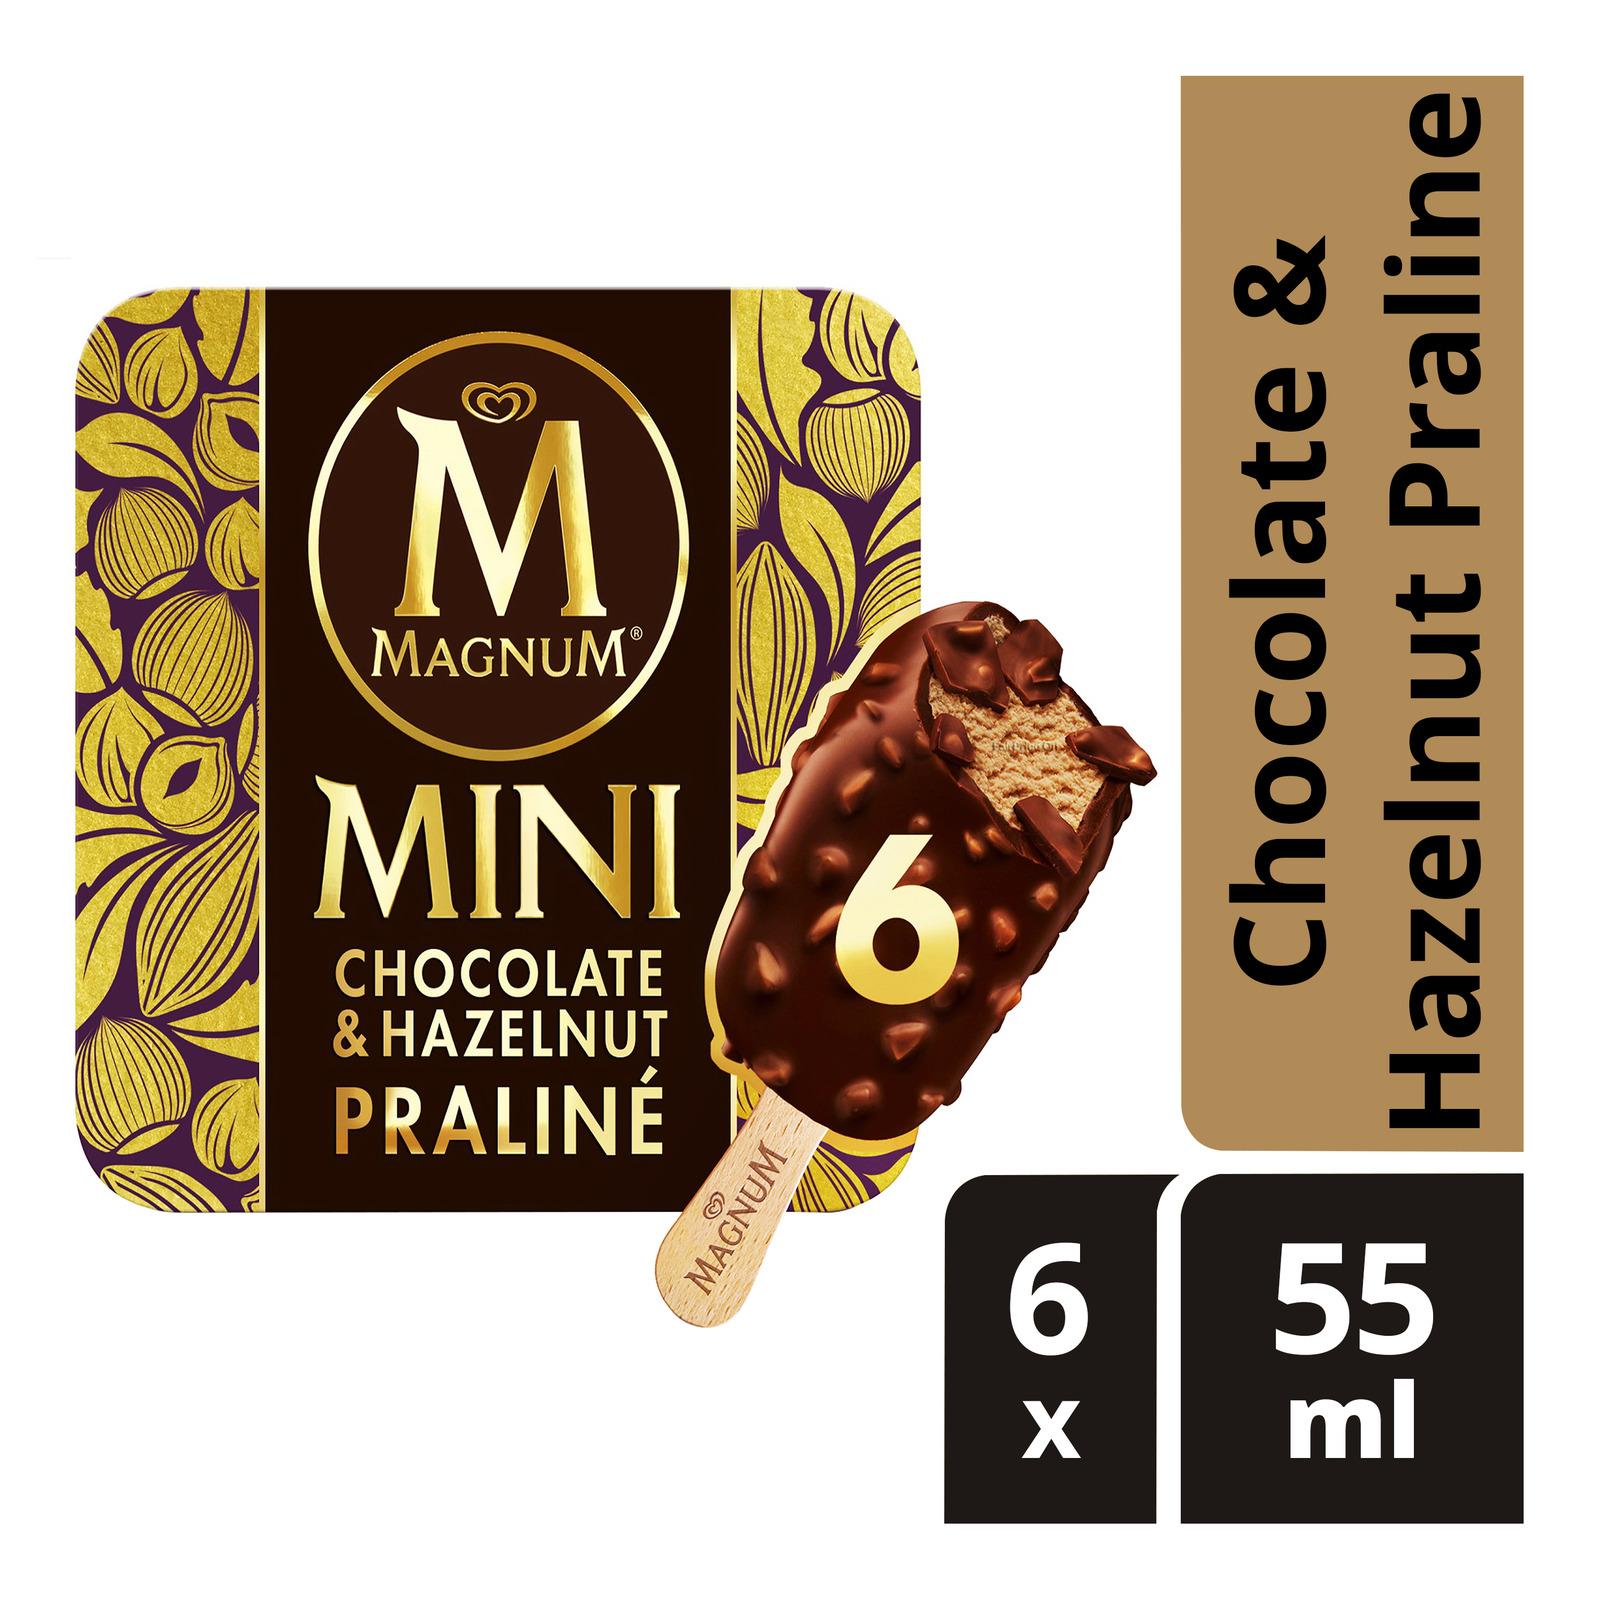 Magnum Mini Ice Cream - Chocolate & Hazelnut Praline